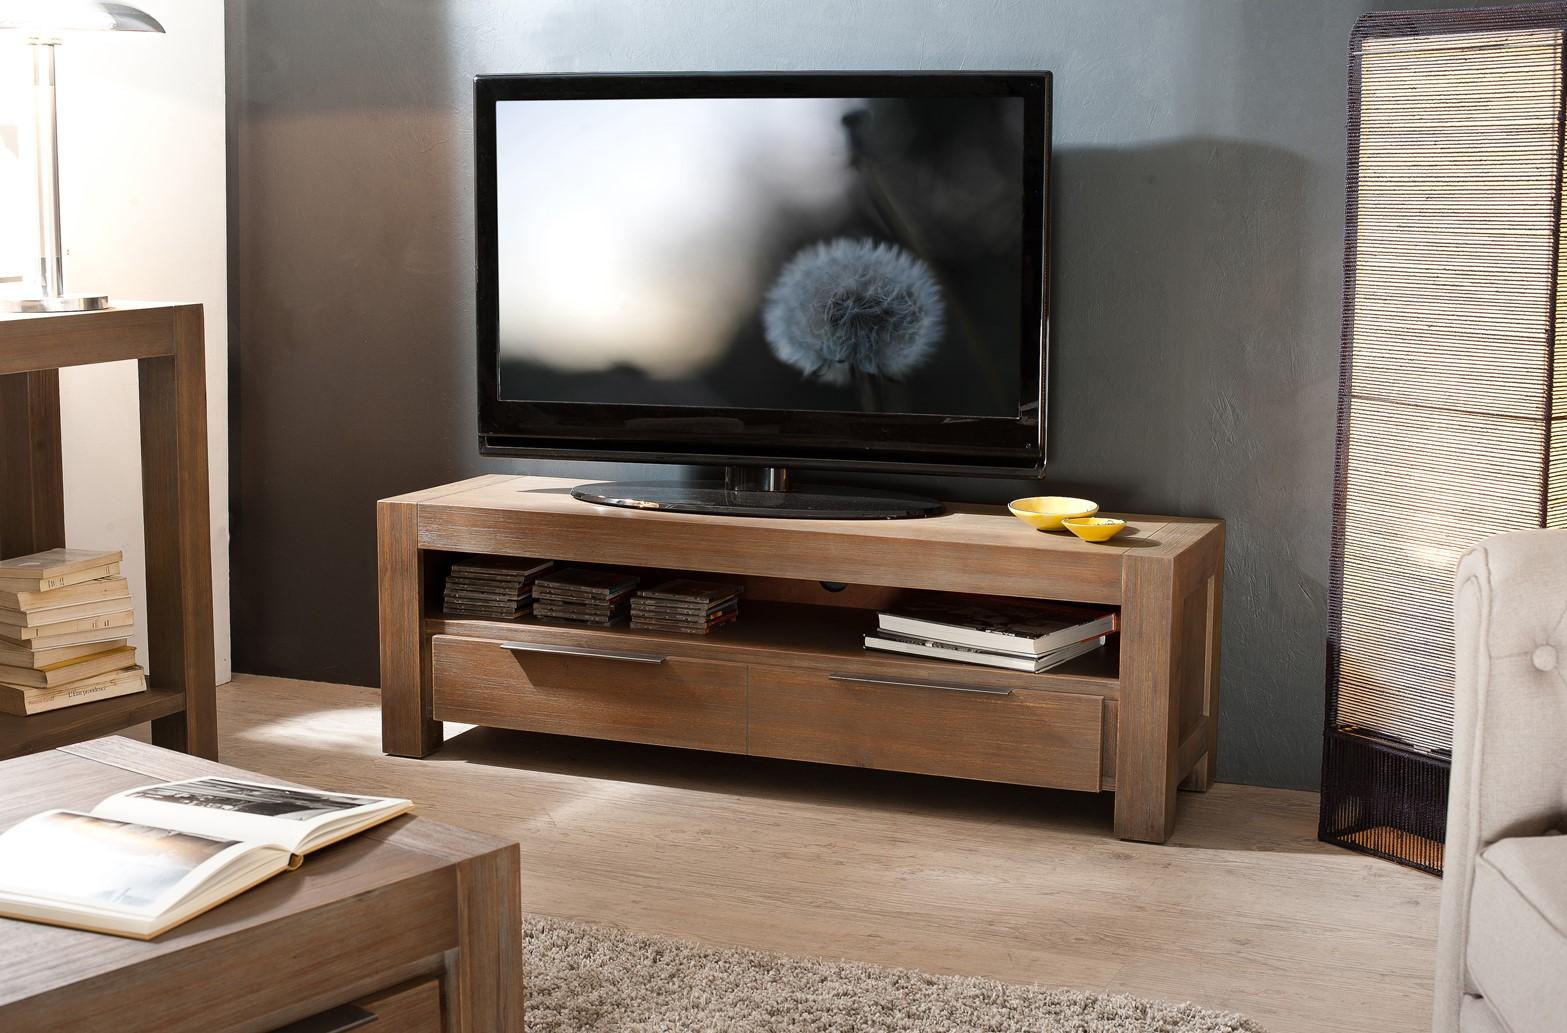 meuble tv nany acacia 140 cm 1 tiroir meubles tv pier import